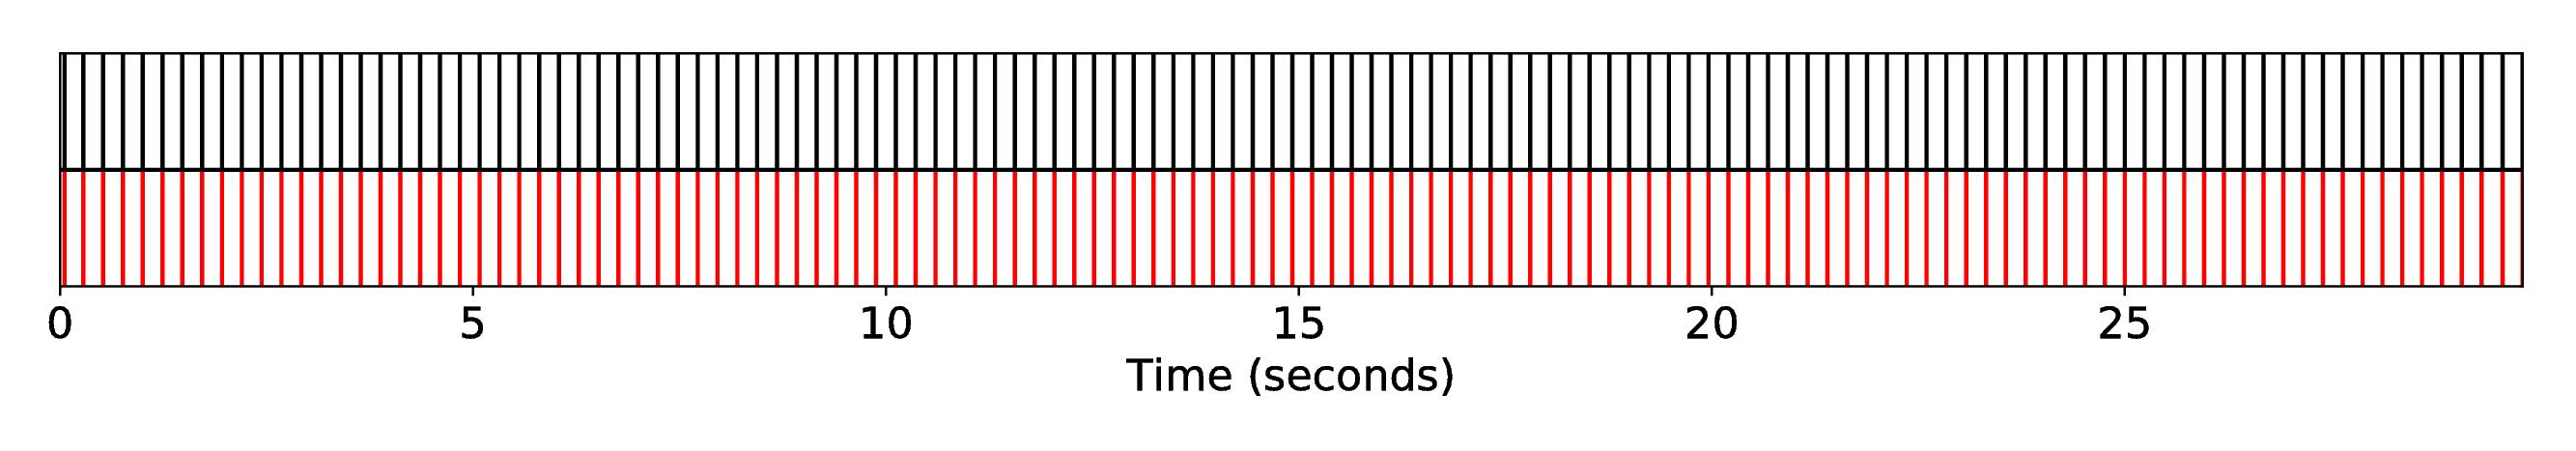 DP1_INT1_R-MRI-12__S-Broke__SequenceAlignment